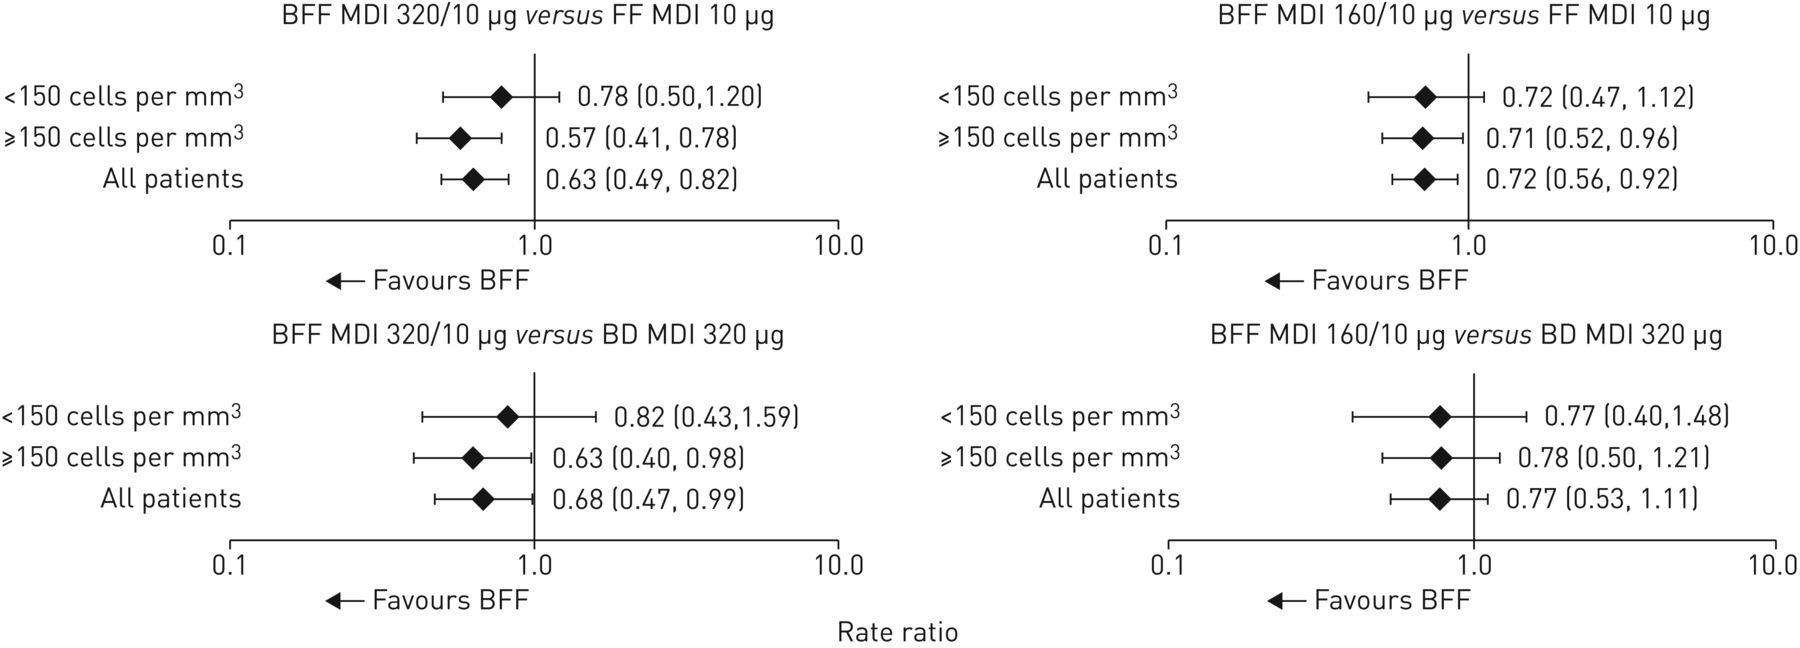 Budesonide/formoterol MDI with co-suspension delivery